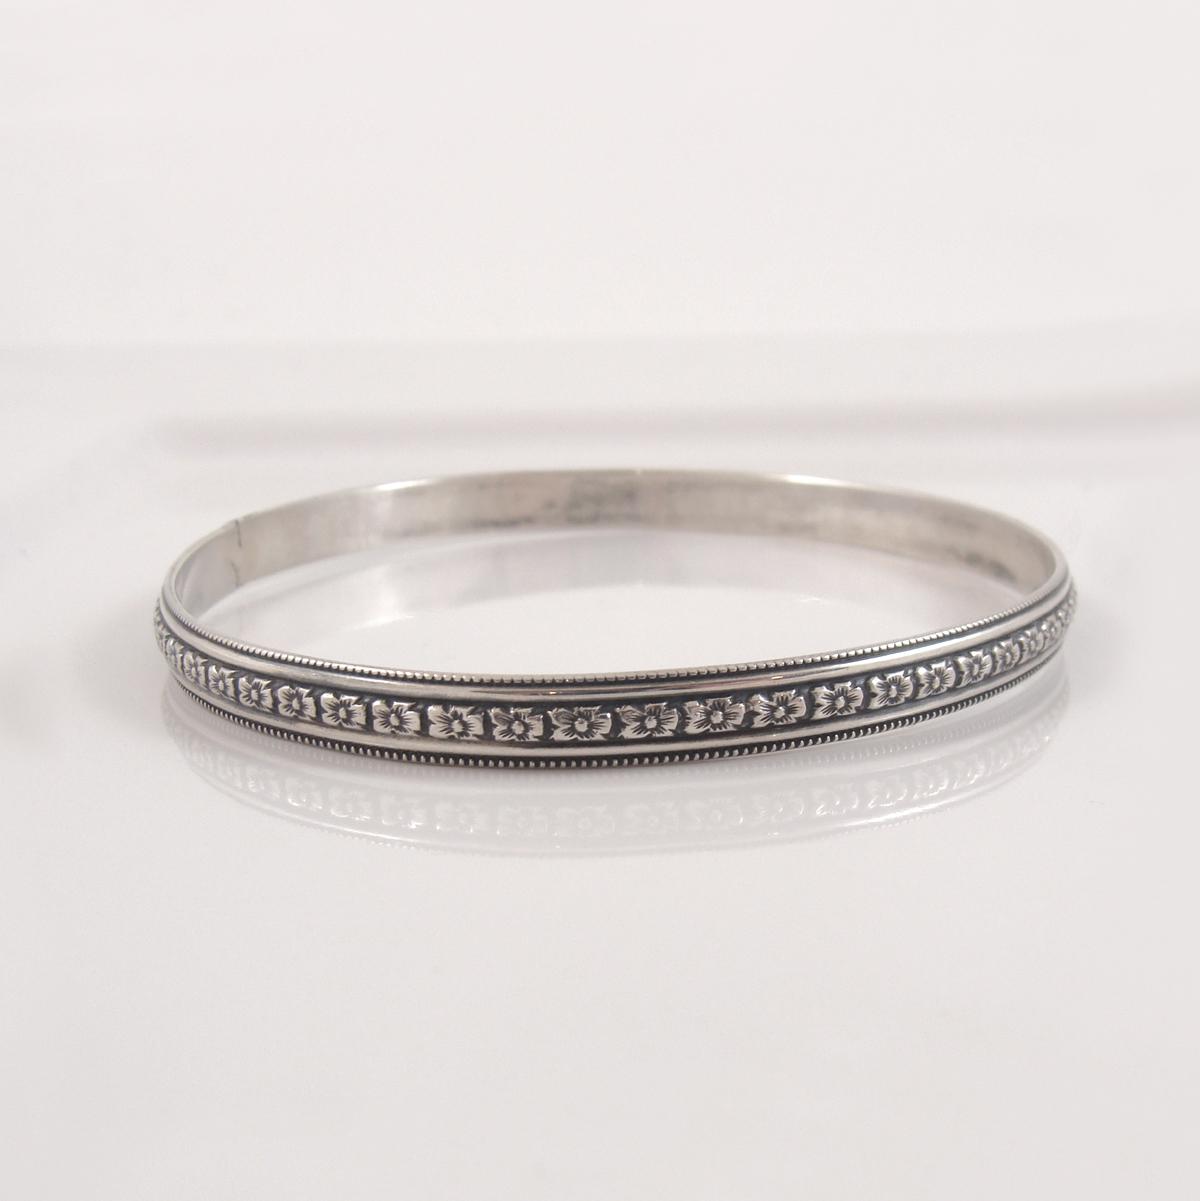 sterling silver floral bangle